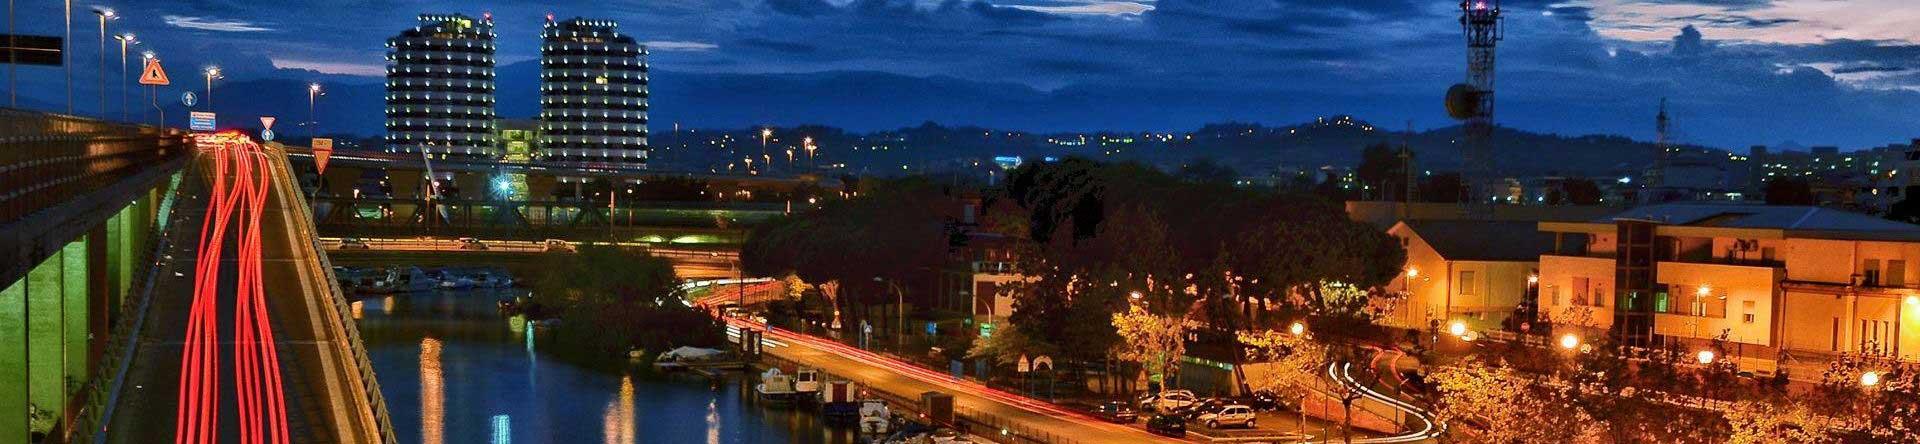 Pescara notte